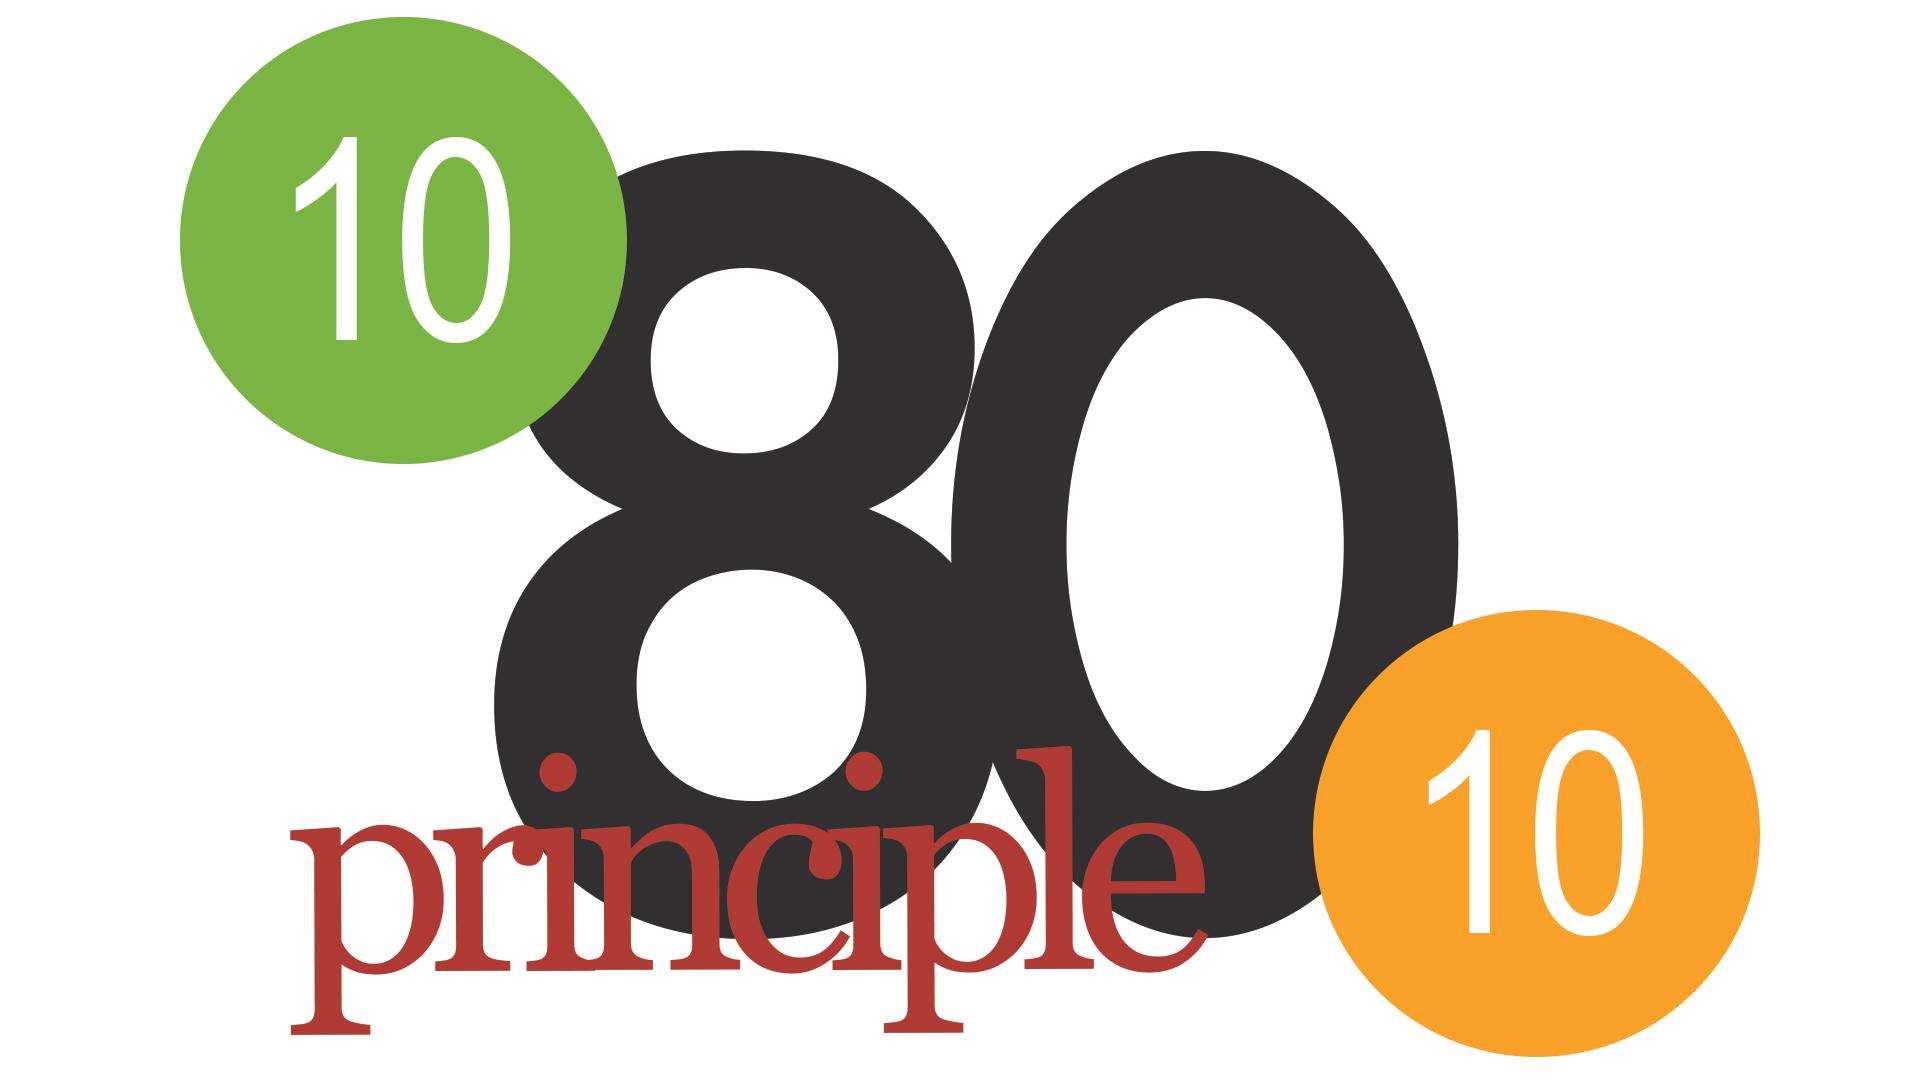 10 10 80 principle.jpg